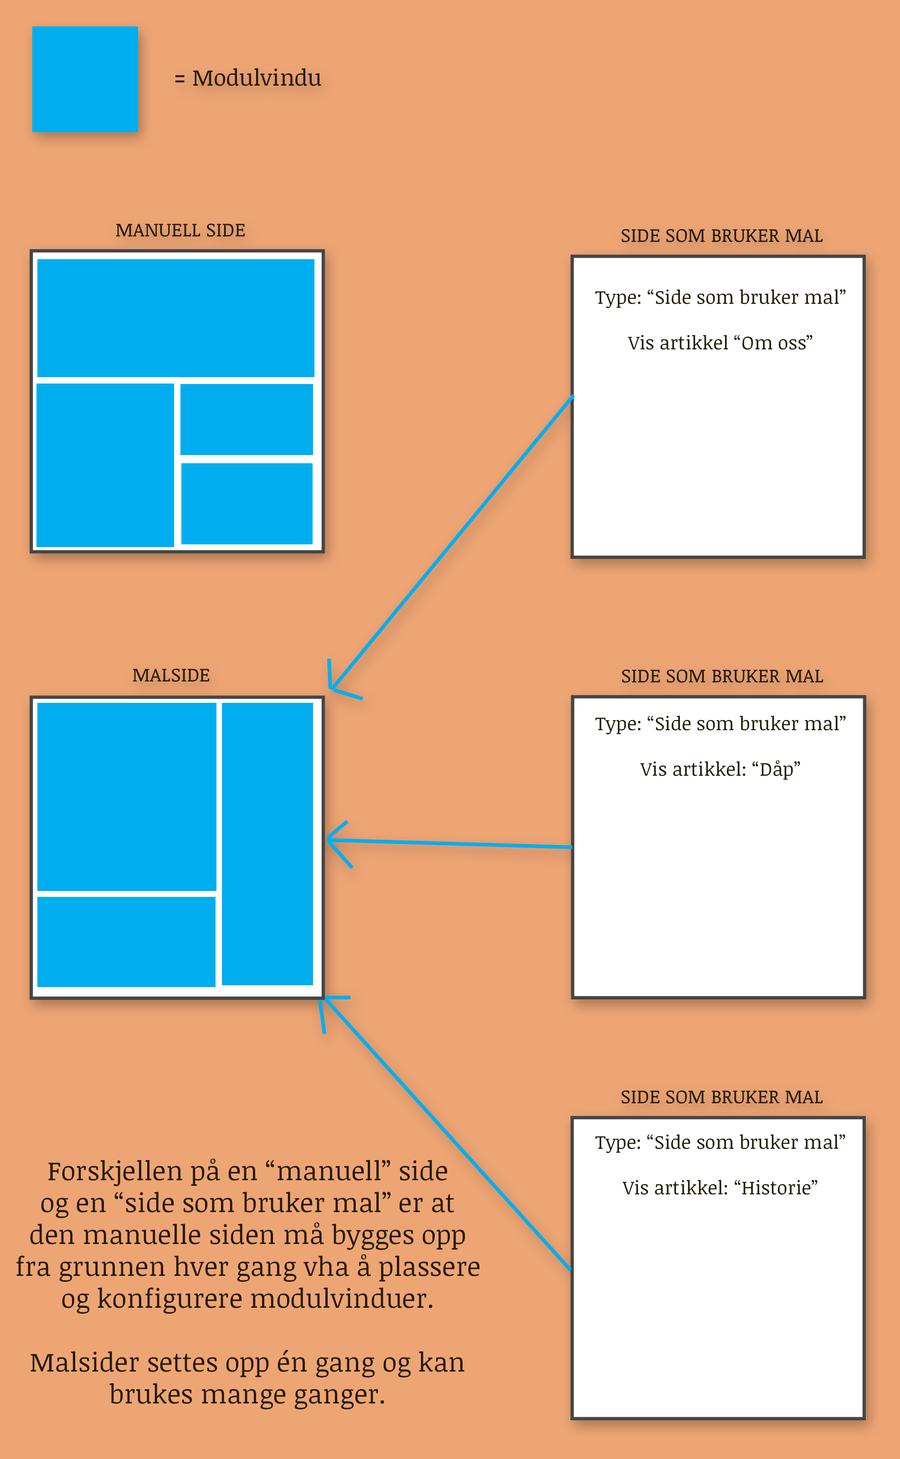 Malside vs vanlig (manuell) side